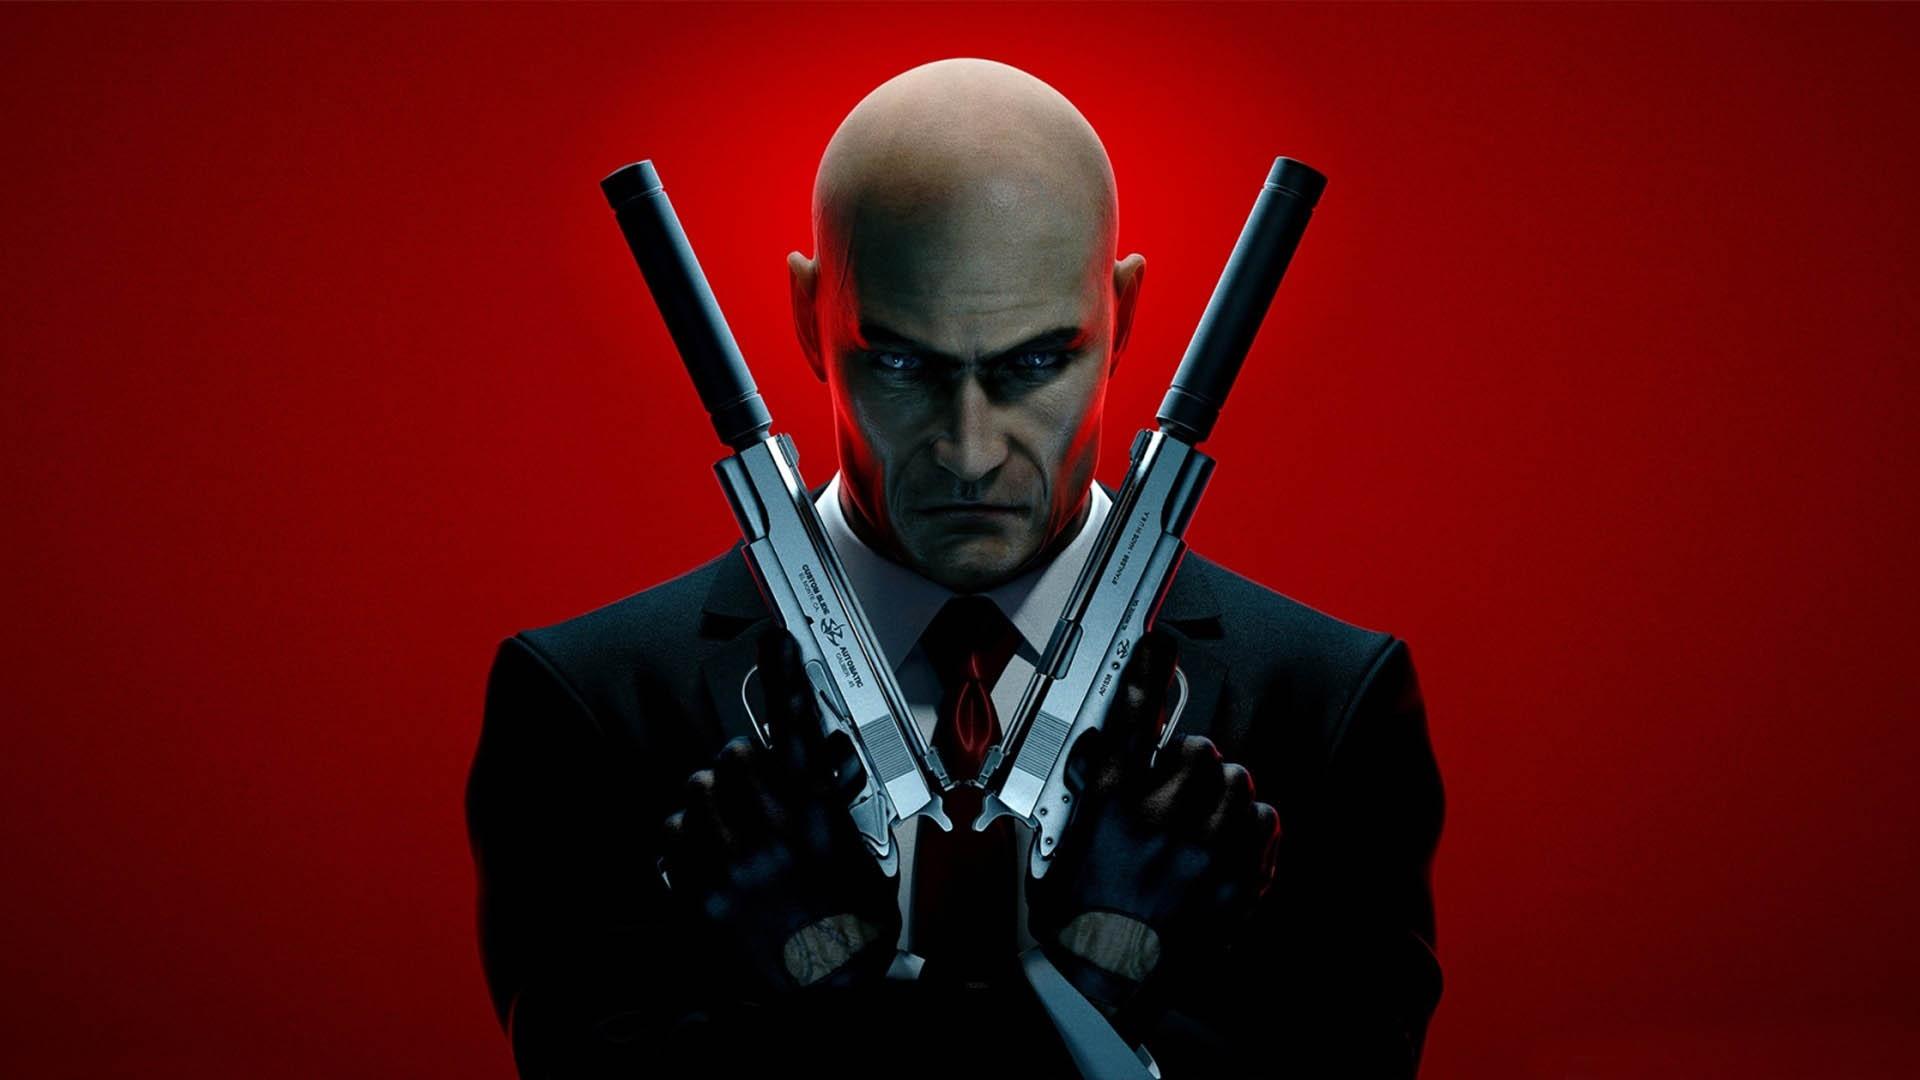 HITMAN 3: Agent 47